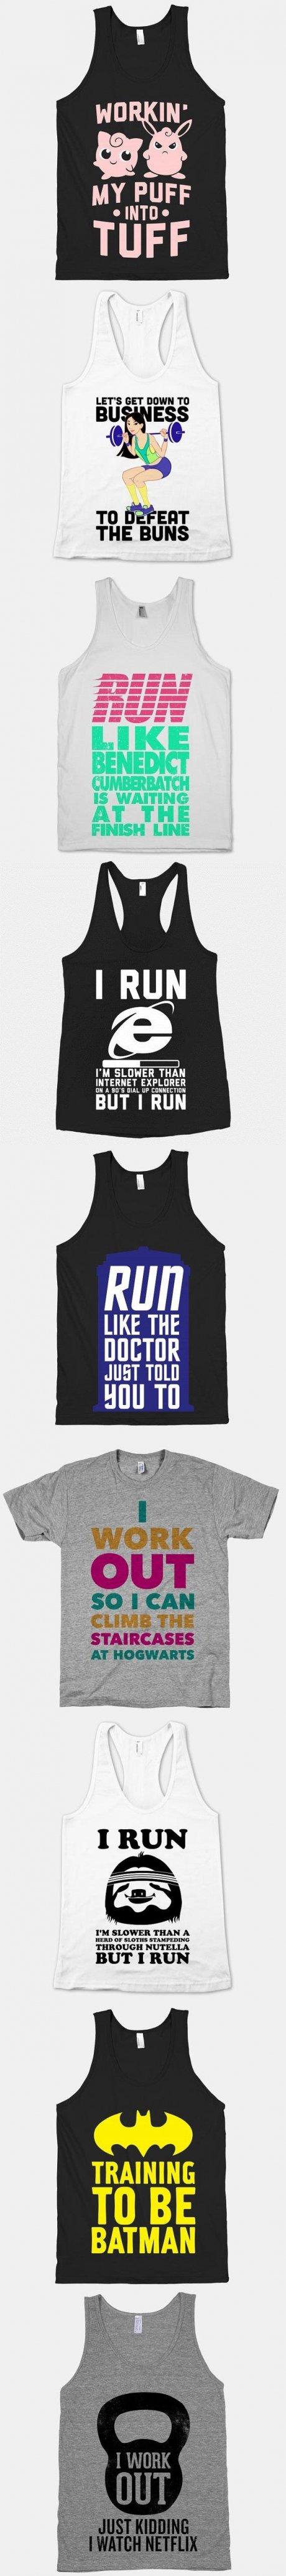 If Gym Clothes Were Honest.. funny ass shirts.. ELOHEL THAN u U ENE END RUN LIKE THE MISTER HUN TI] I RUN ETTA urn: nutn Matt, LA BUT! RUN TRAINING TO BE BATMAN If Gym Clothes Were Honest funny ass shirts ELOHEL THAN u U ENE END RUN LIKE THE MISTER HUN TI] I ETTA urn: nutn Matt LA BUT! TRAINING TO BE BATMAN